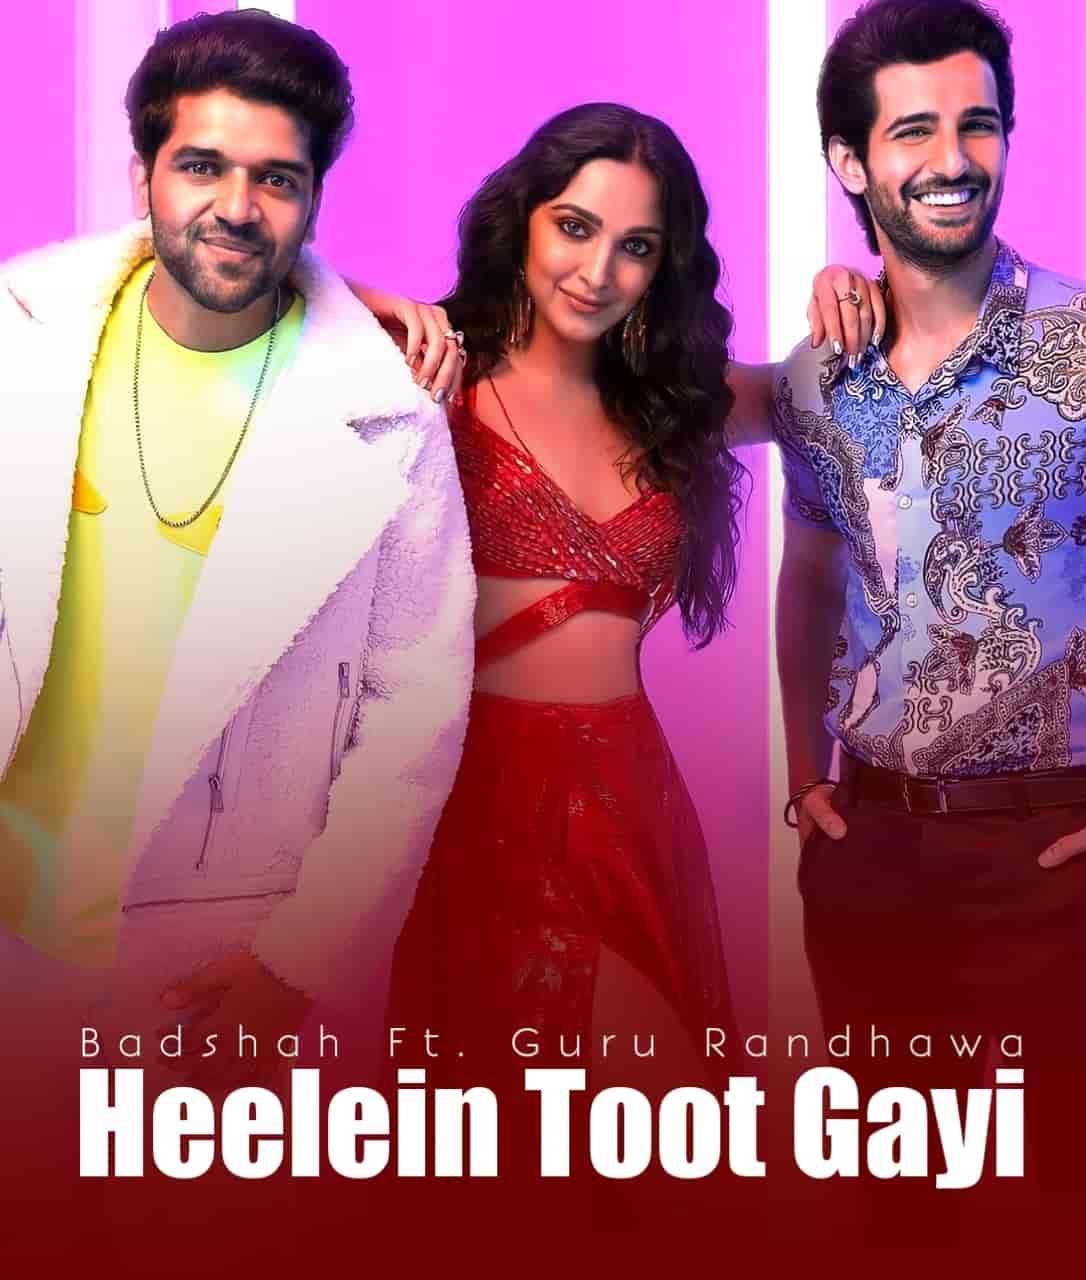 Heelein Toot Gayi Song Image Features Guru Randhawa, Kiara Advani and Badshah